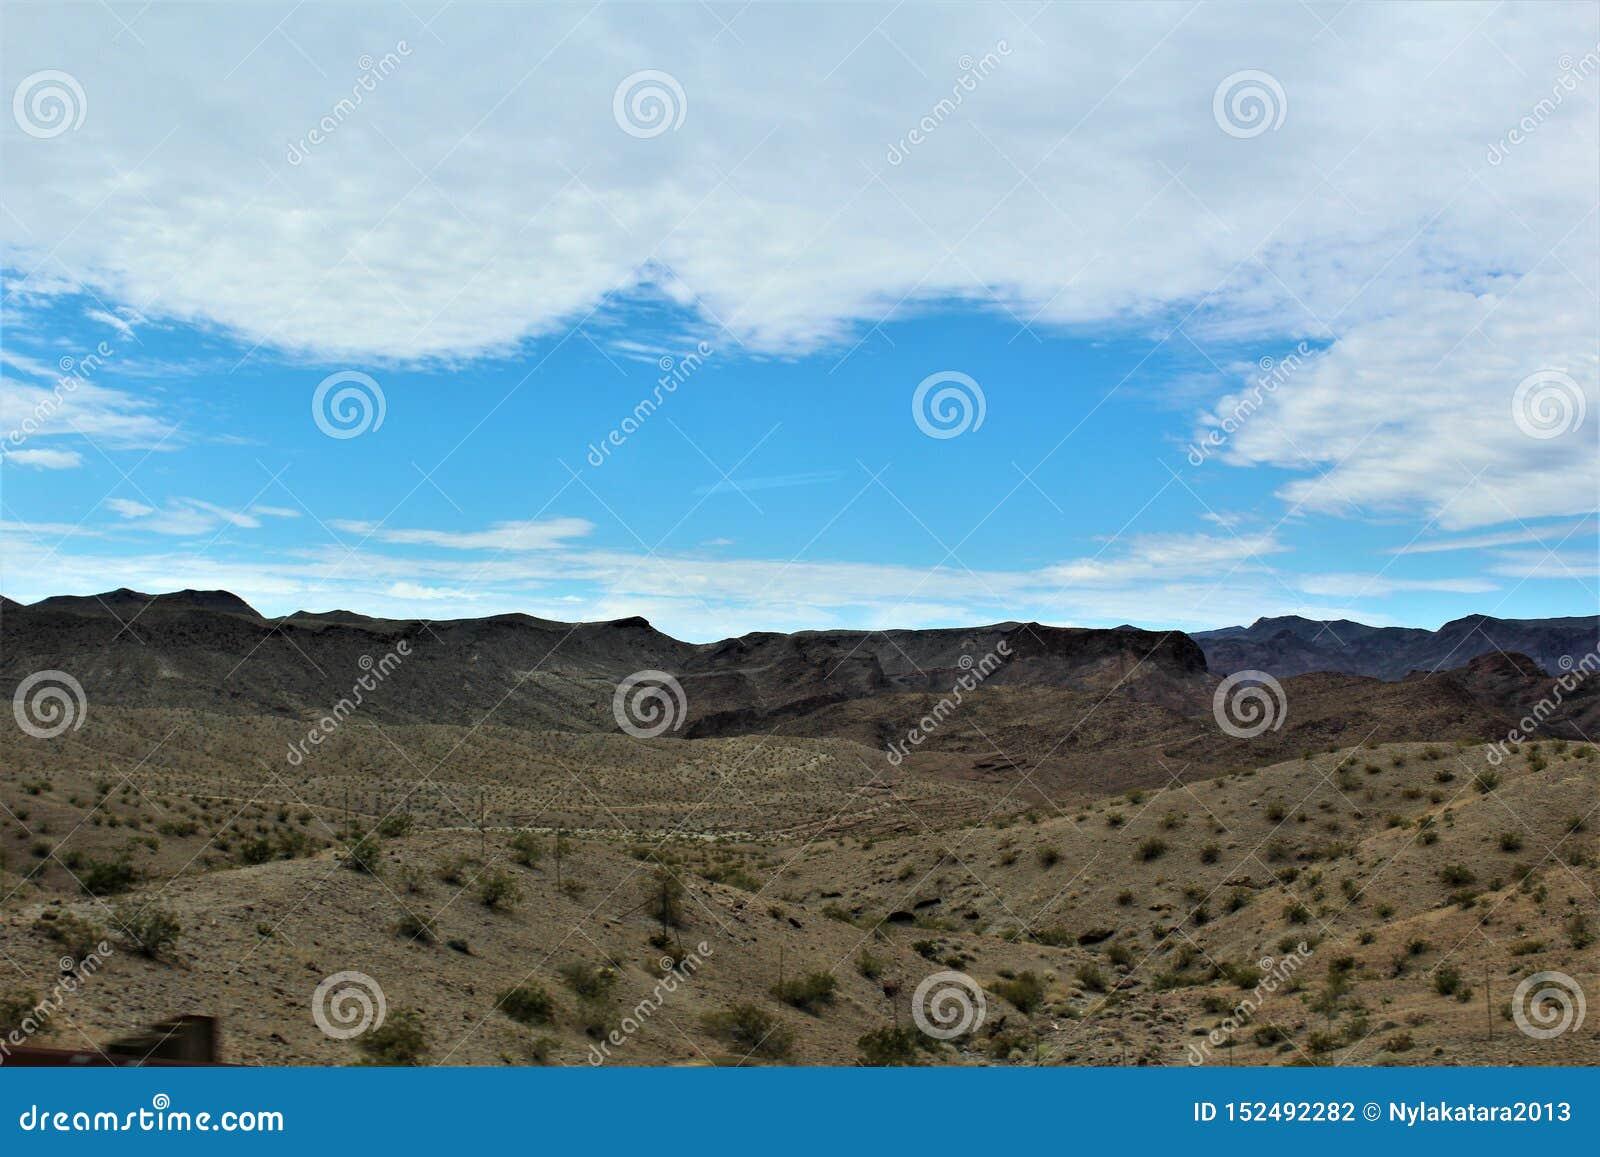 Scenic landscape view Las Vegas to Phoenix, Arizona, United States